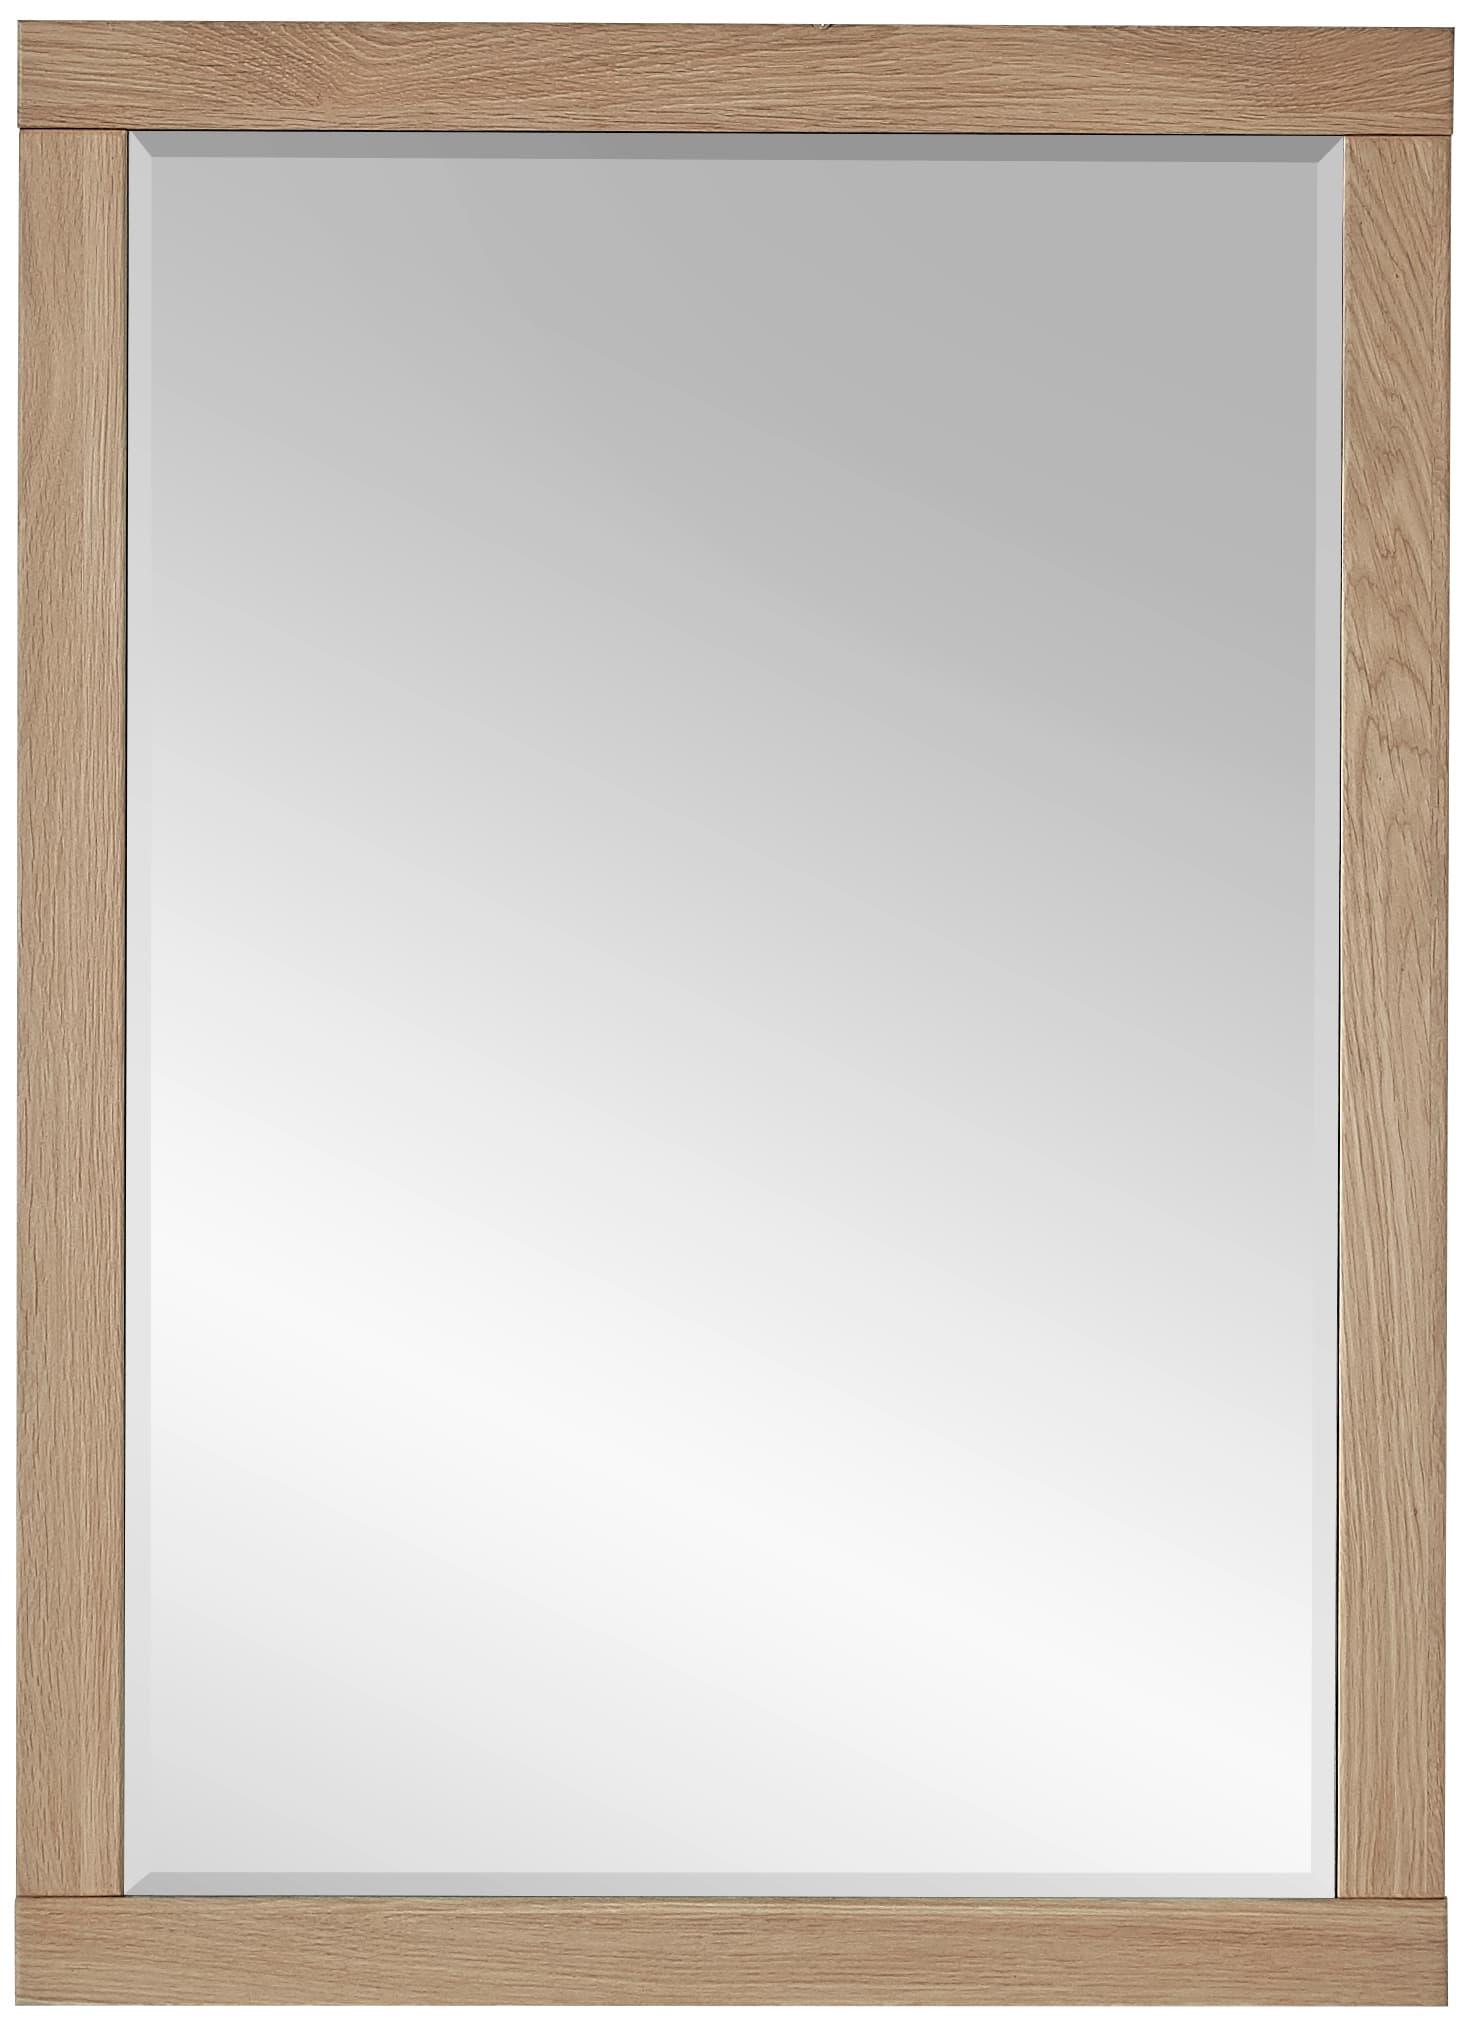 Oglinda din pal si MDF, Archi Natur, 65 x 90 cm imagine